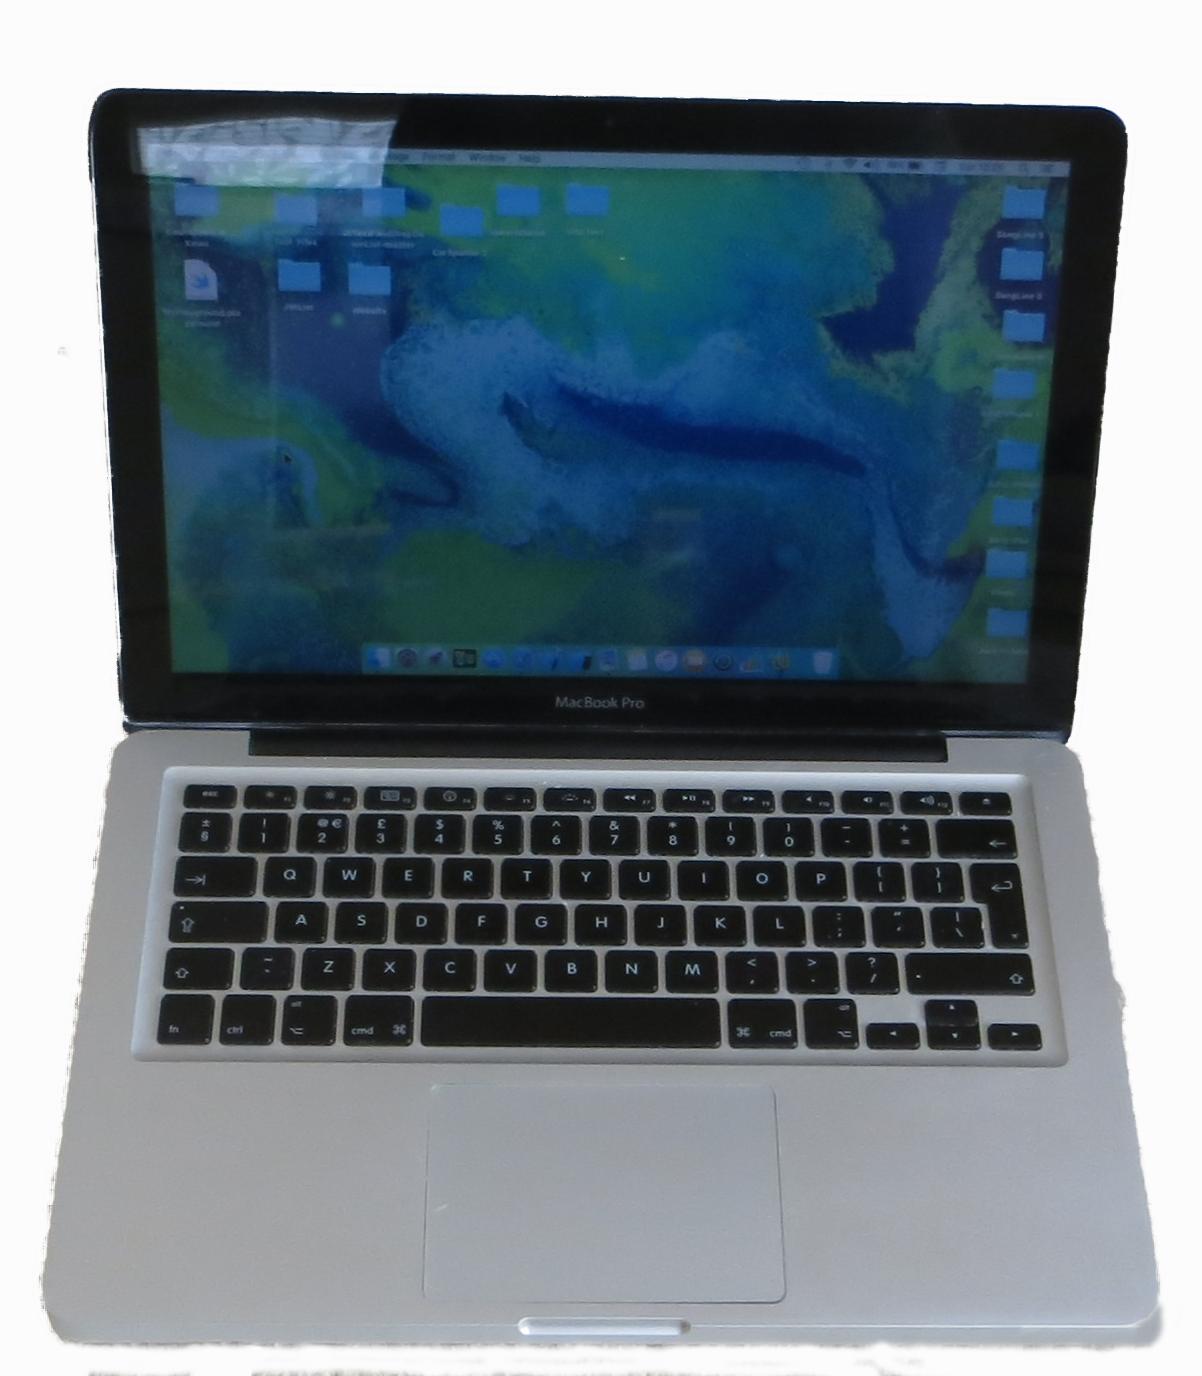 Macbbook Pro Laptop